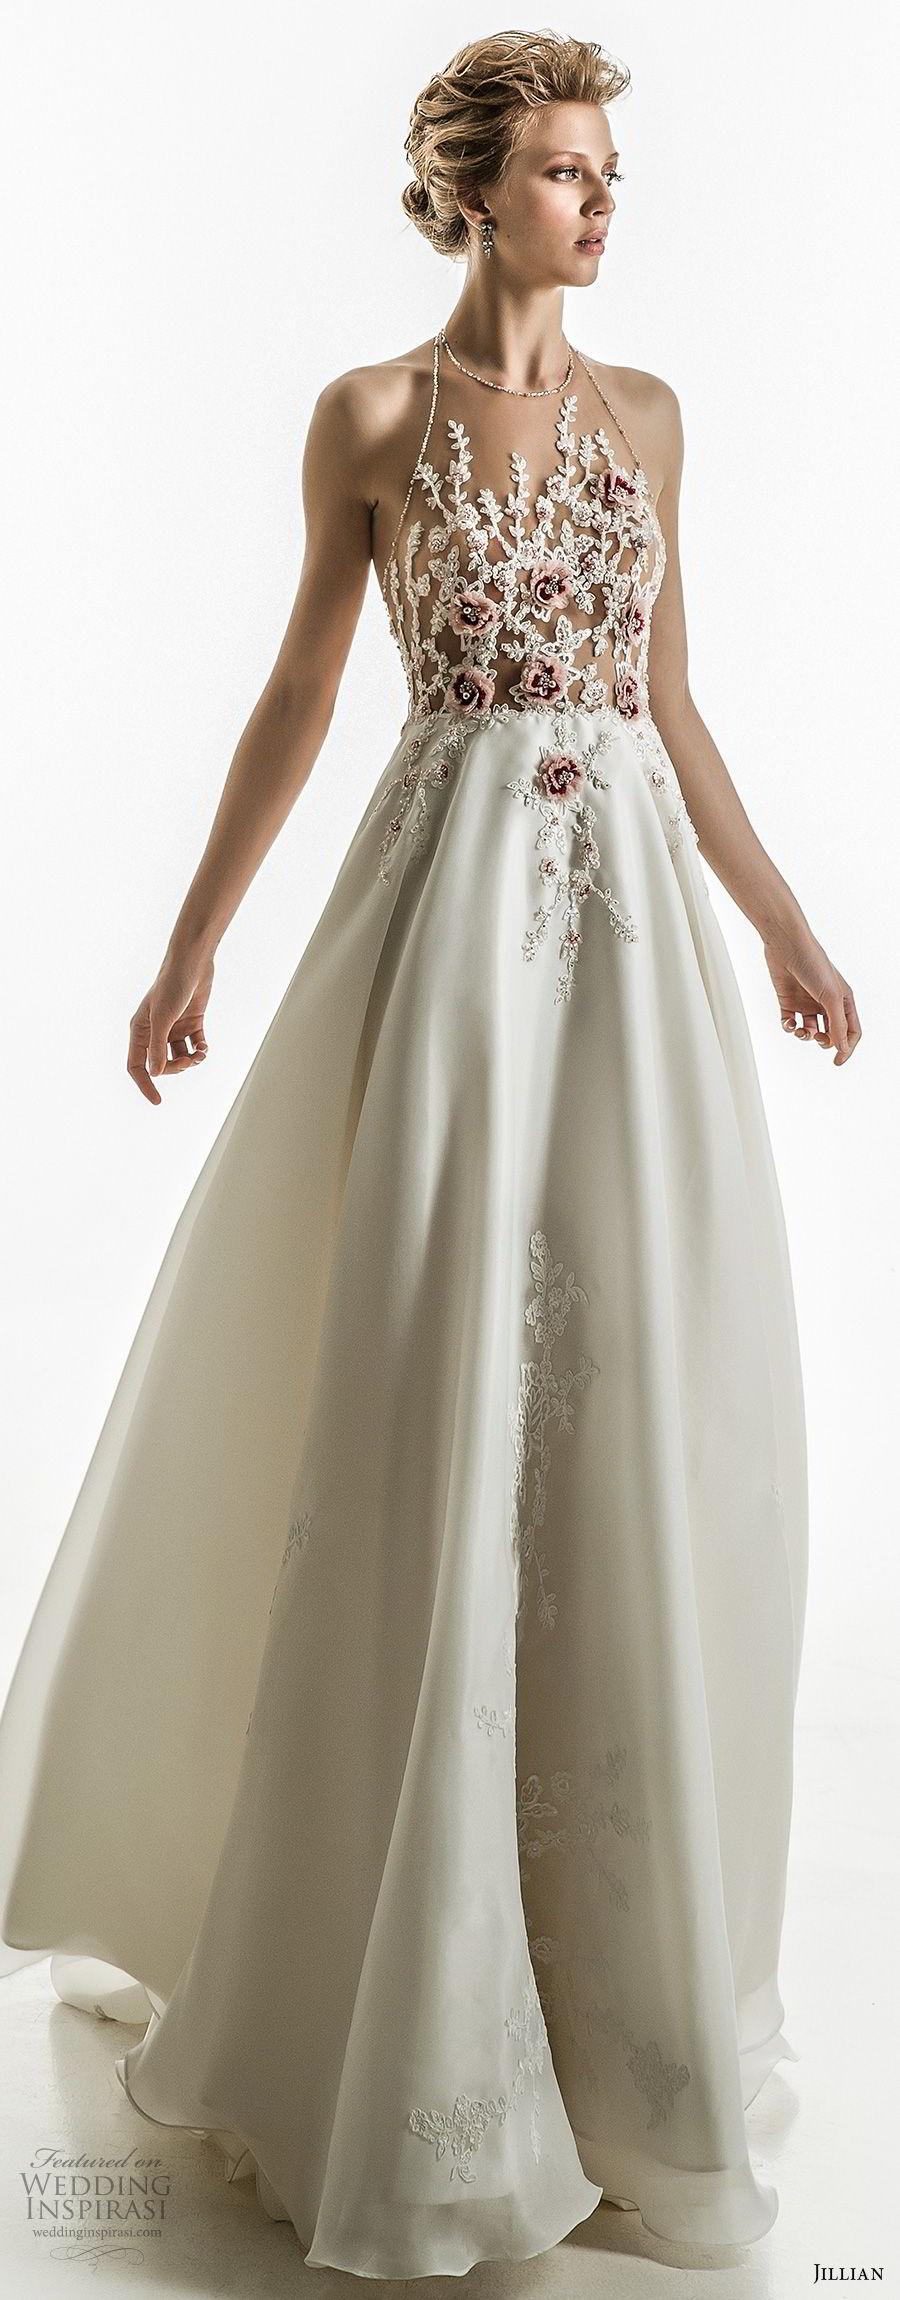 jillian 2018 bridal sleeveless halter neck heavily embellished bodice flowy skirt romantic a  line wedding dress open back chapel train (16) mv